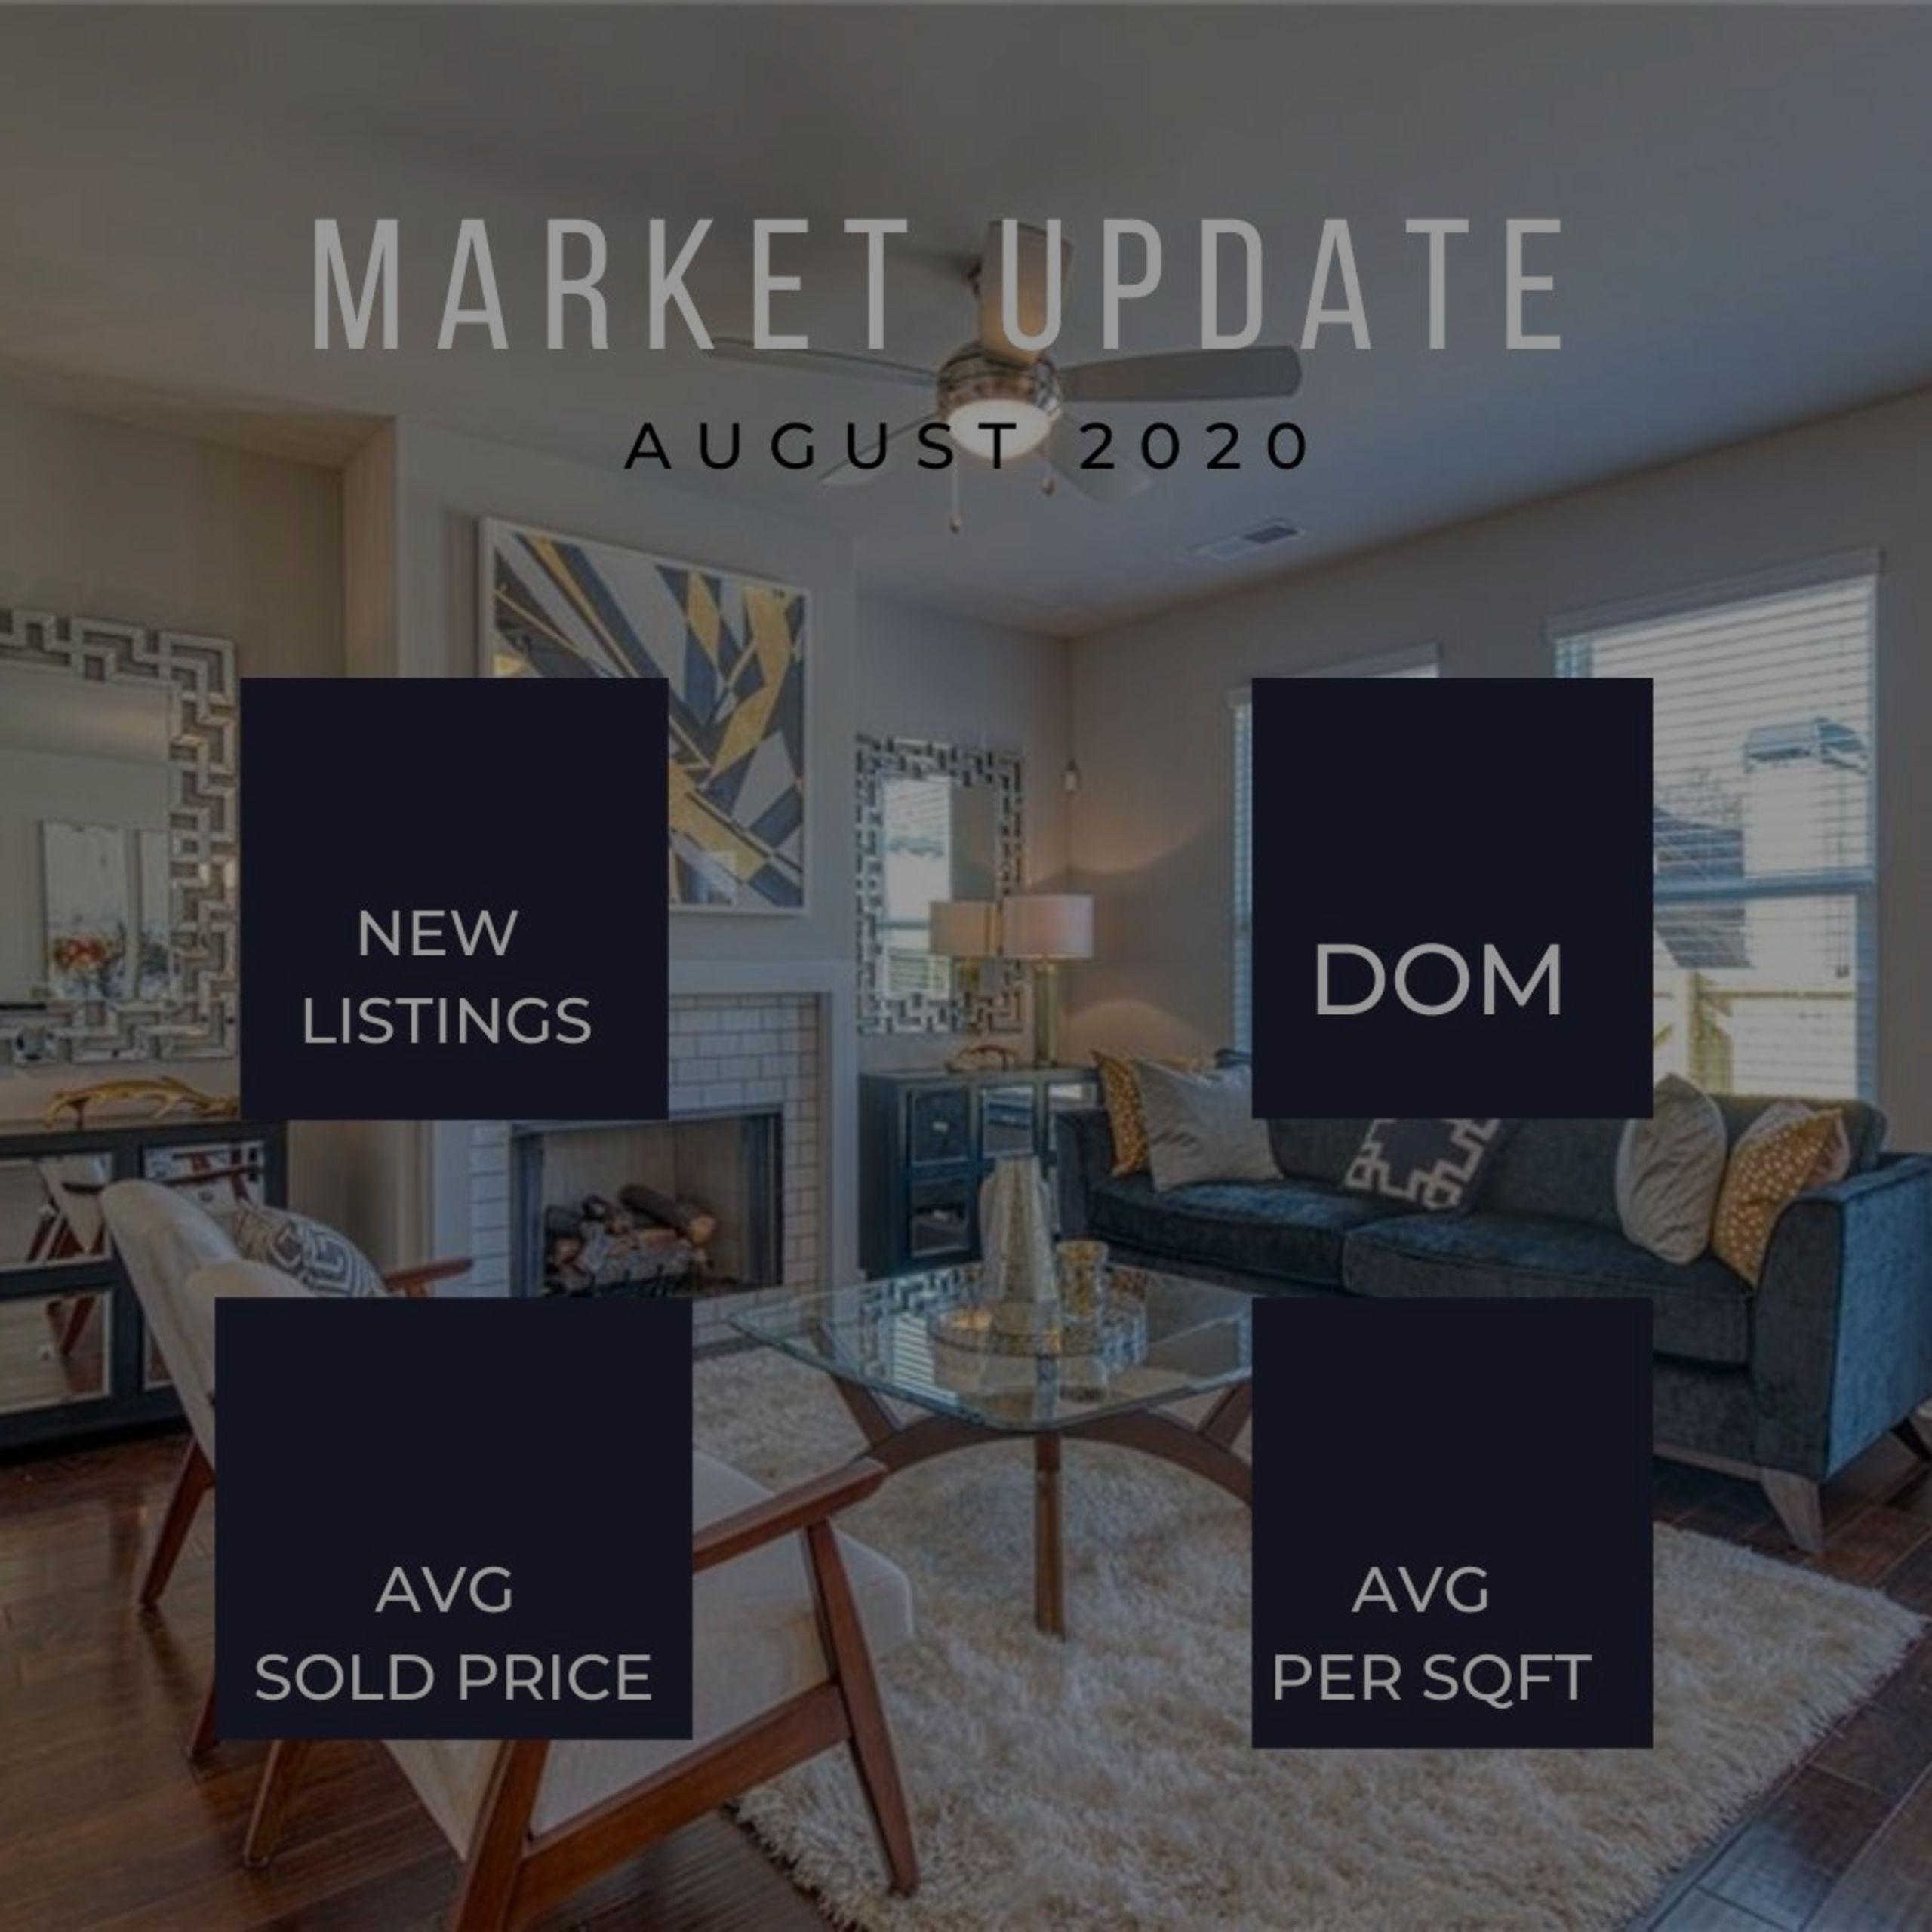 Fall into September: Market Snapshot for August